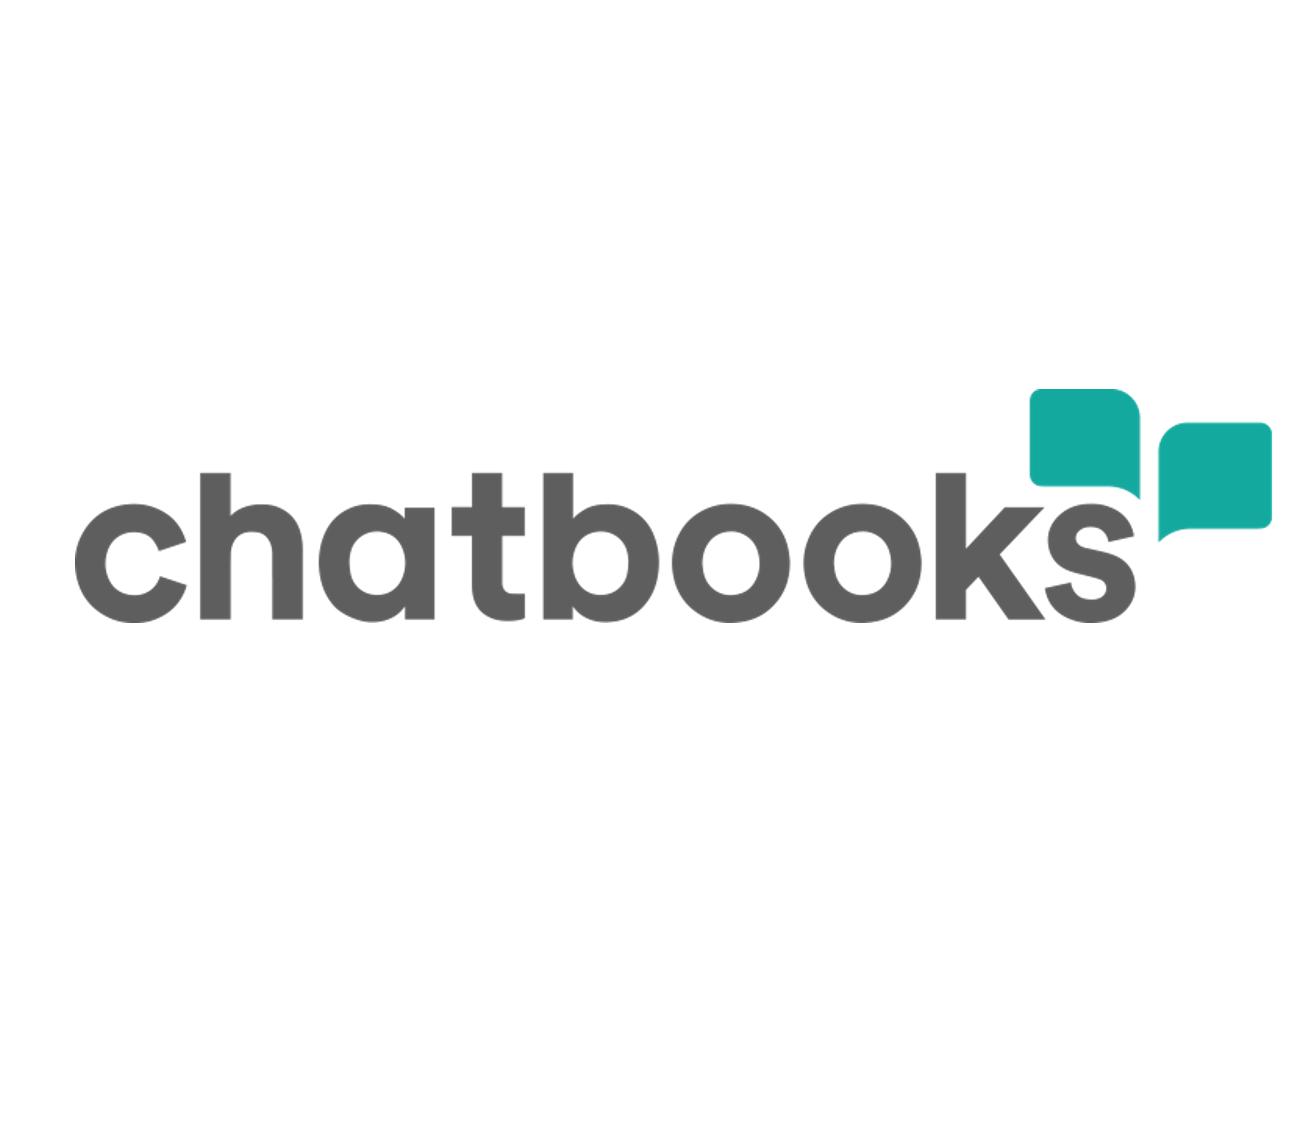 Chatbooks logo